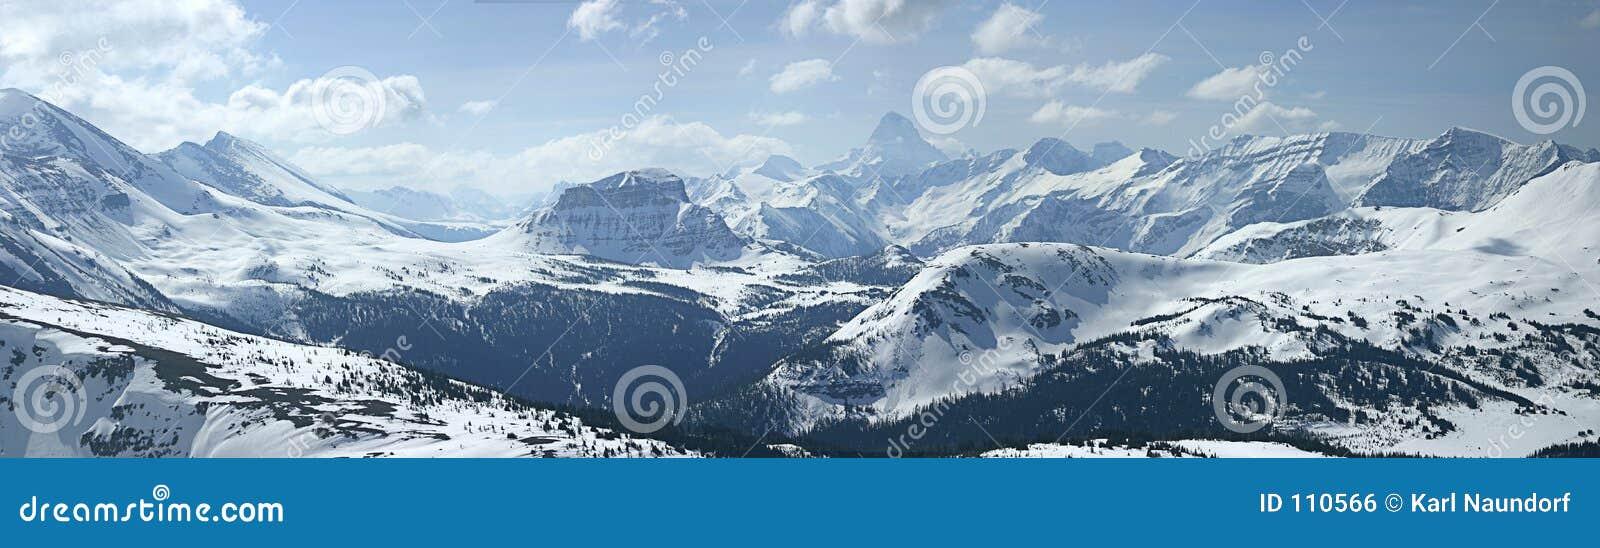 Góra panoramiczna